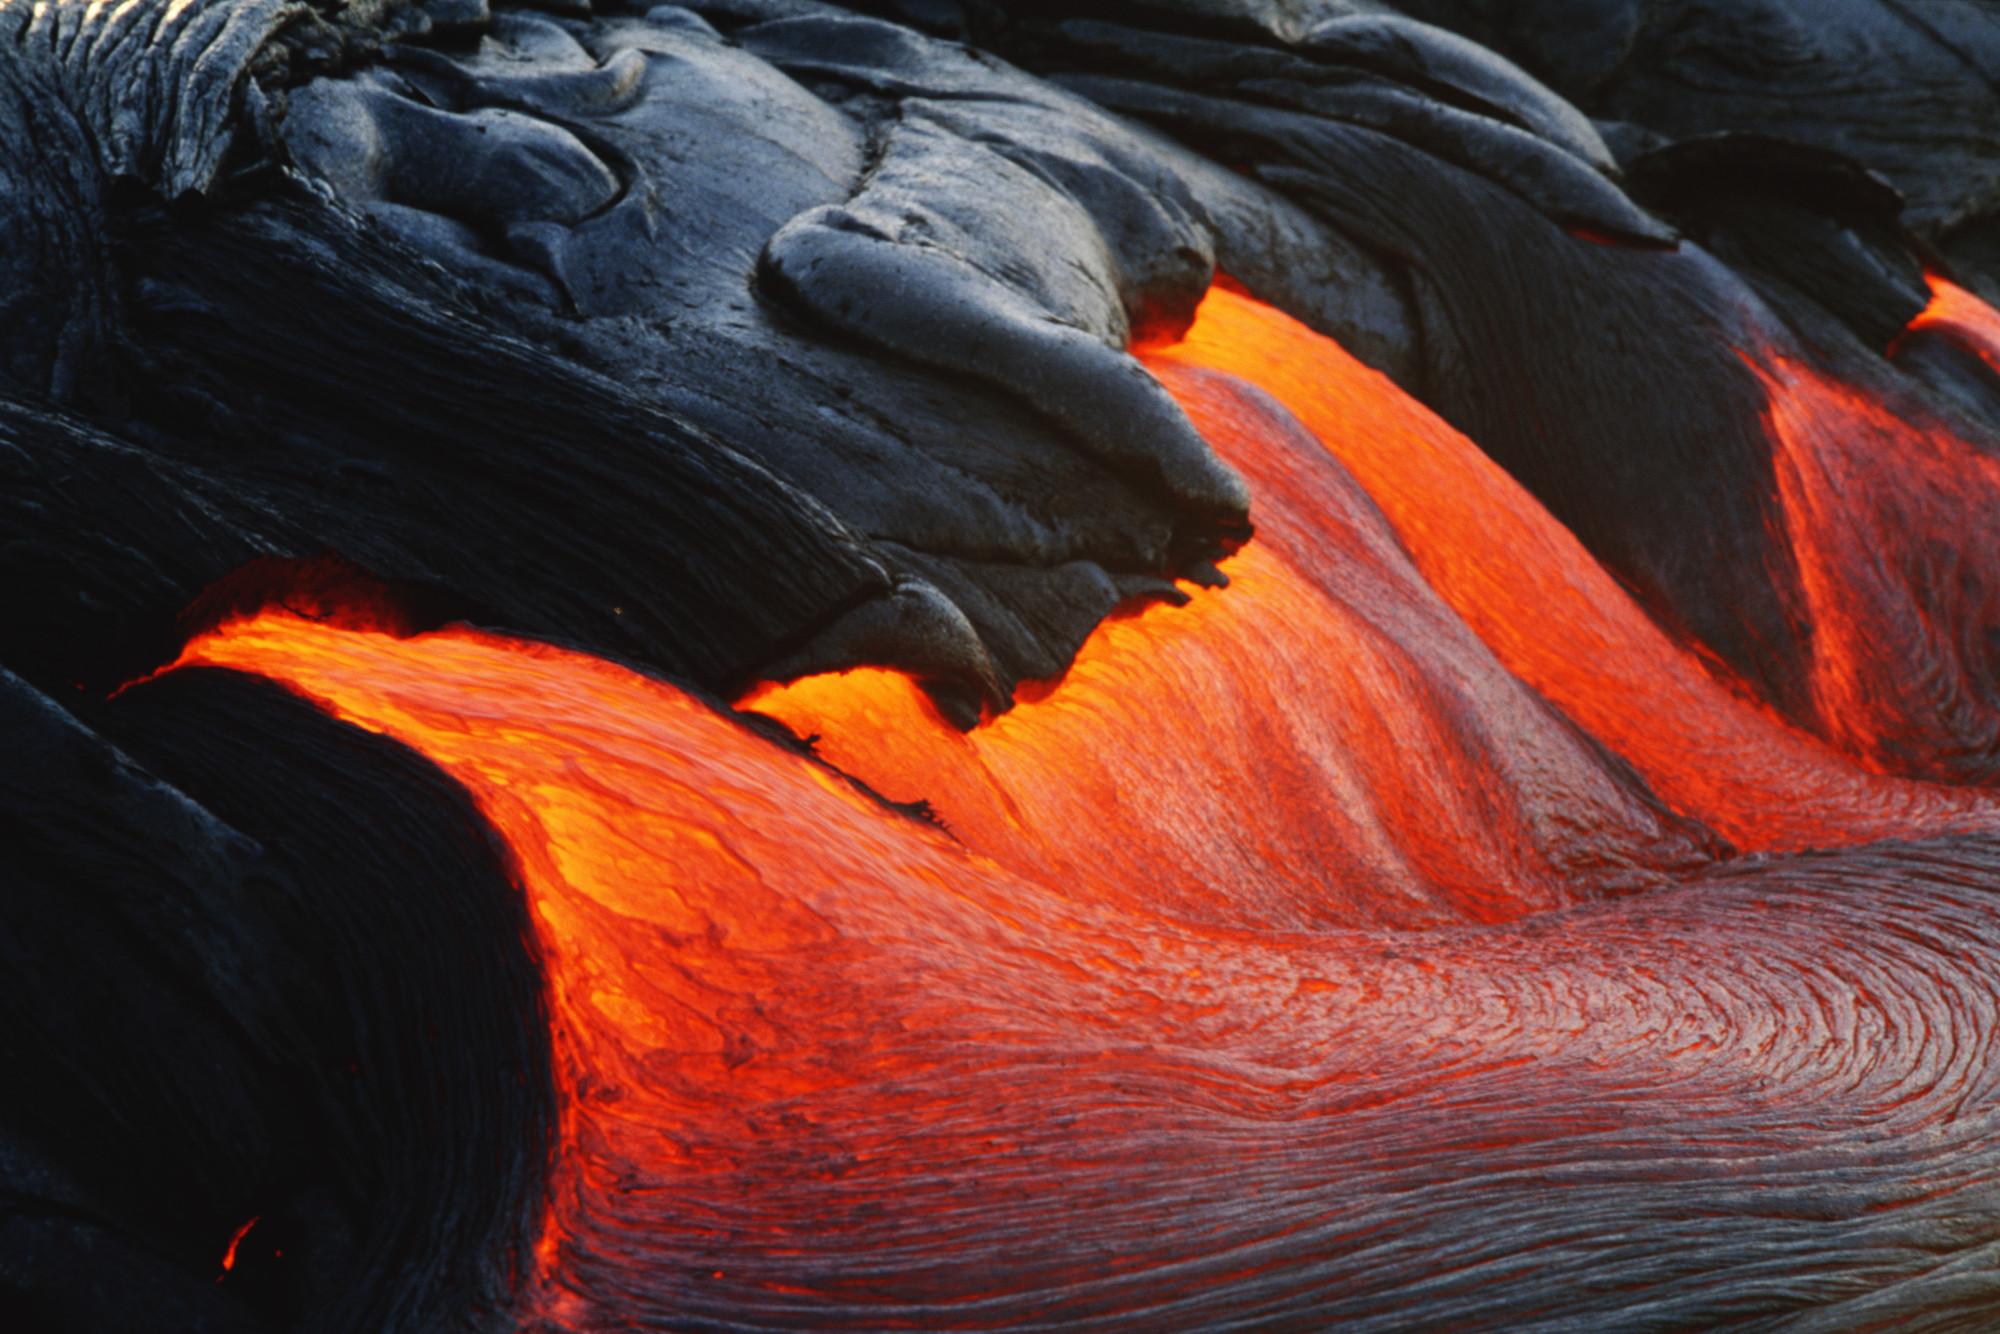 hawaii islands created  volcanic extrusion  study 2000 x 1334 · jpeg